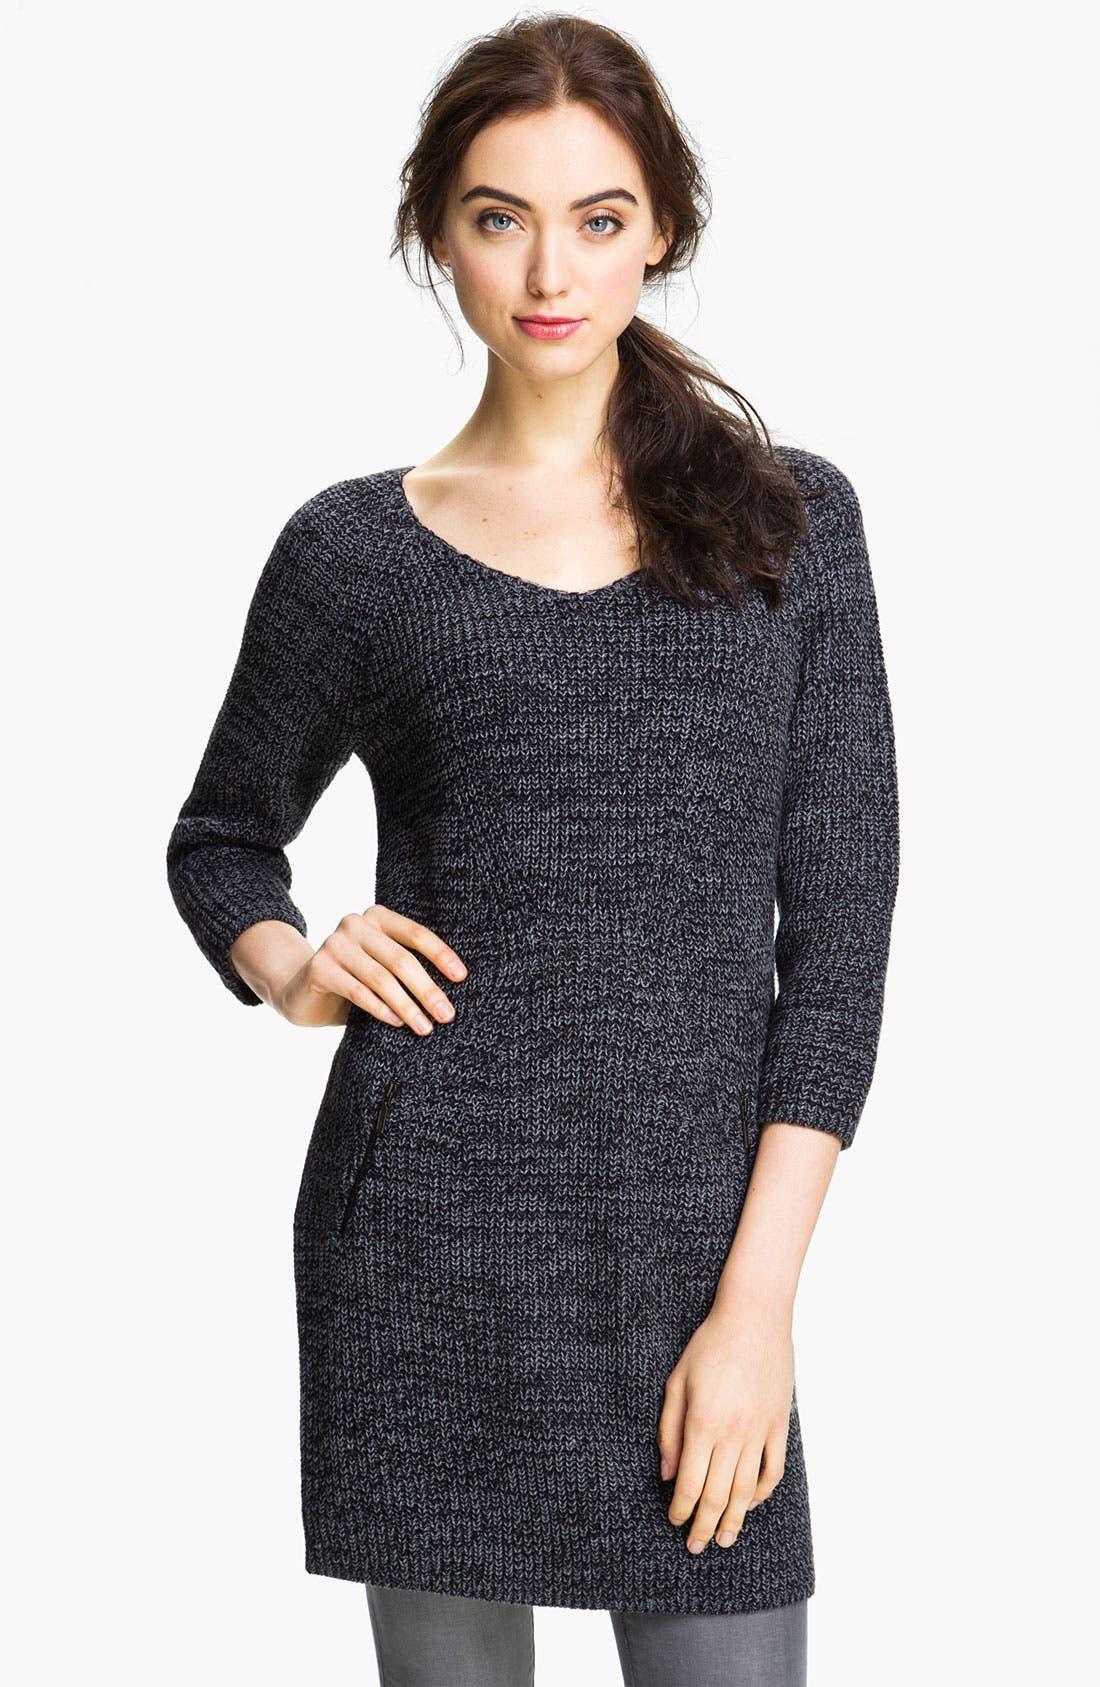 Alternate Image 1 Selected - Caslon® Shaker Stitch Sweater Dress